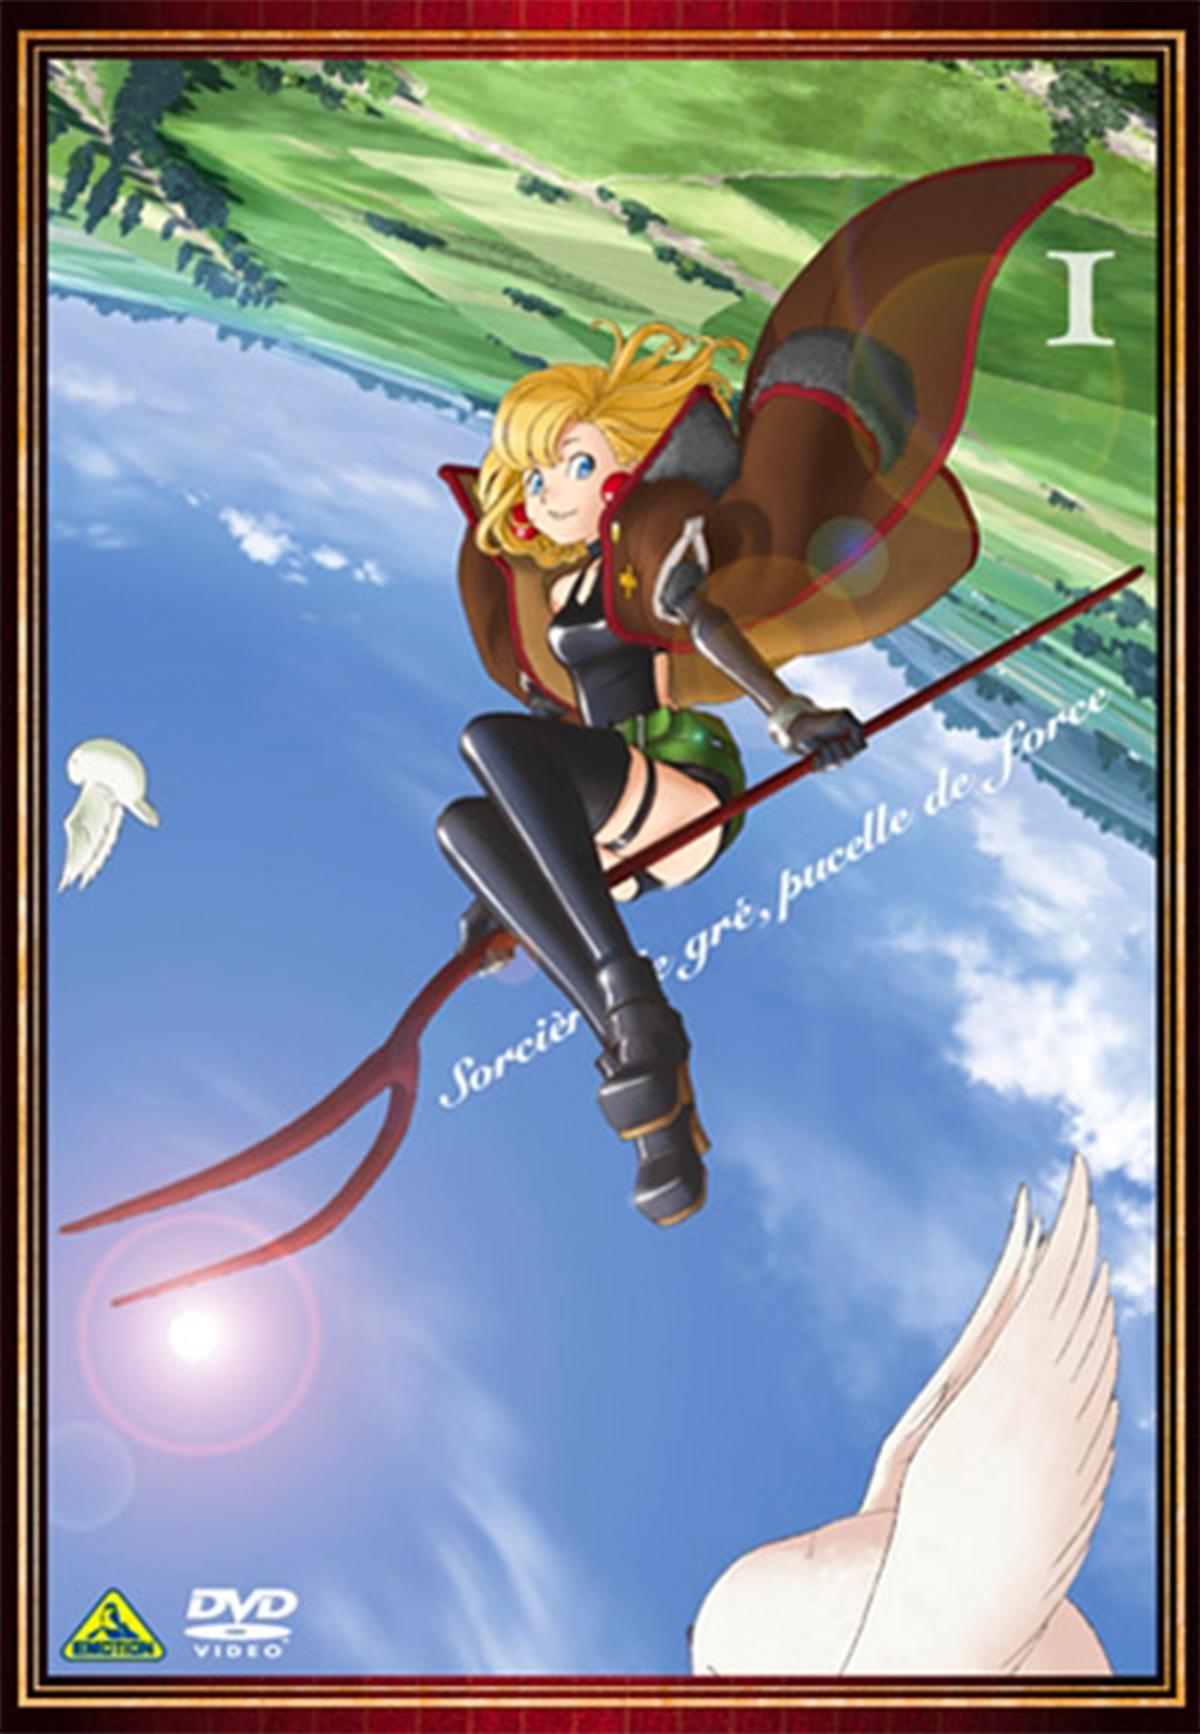 TVアニメ『純潔のマリア』 Blu-ray & DVD